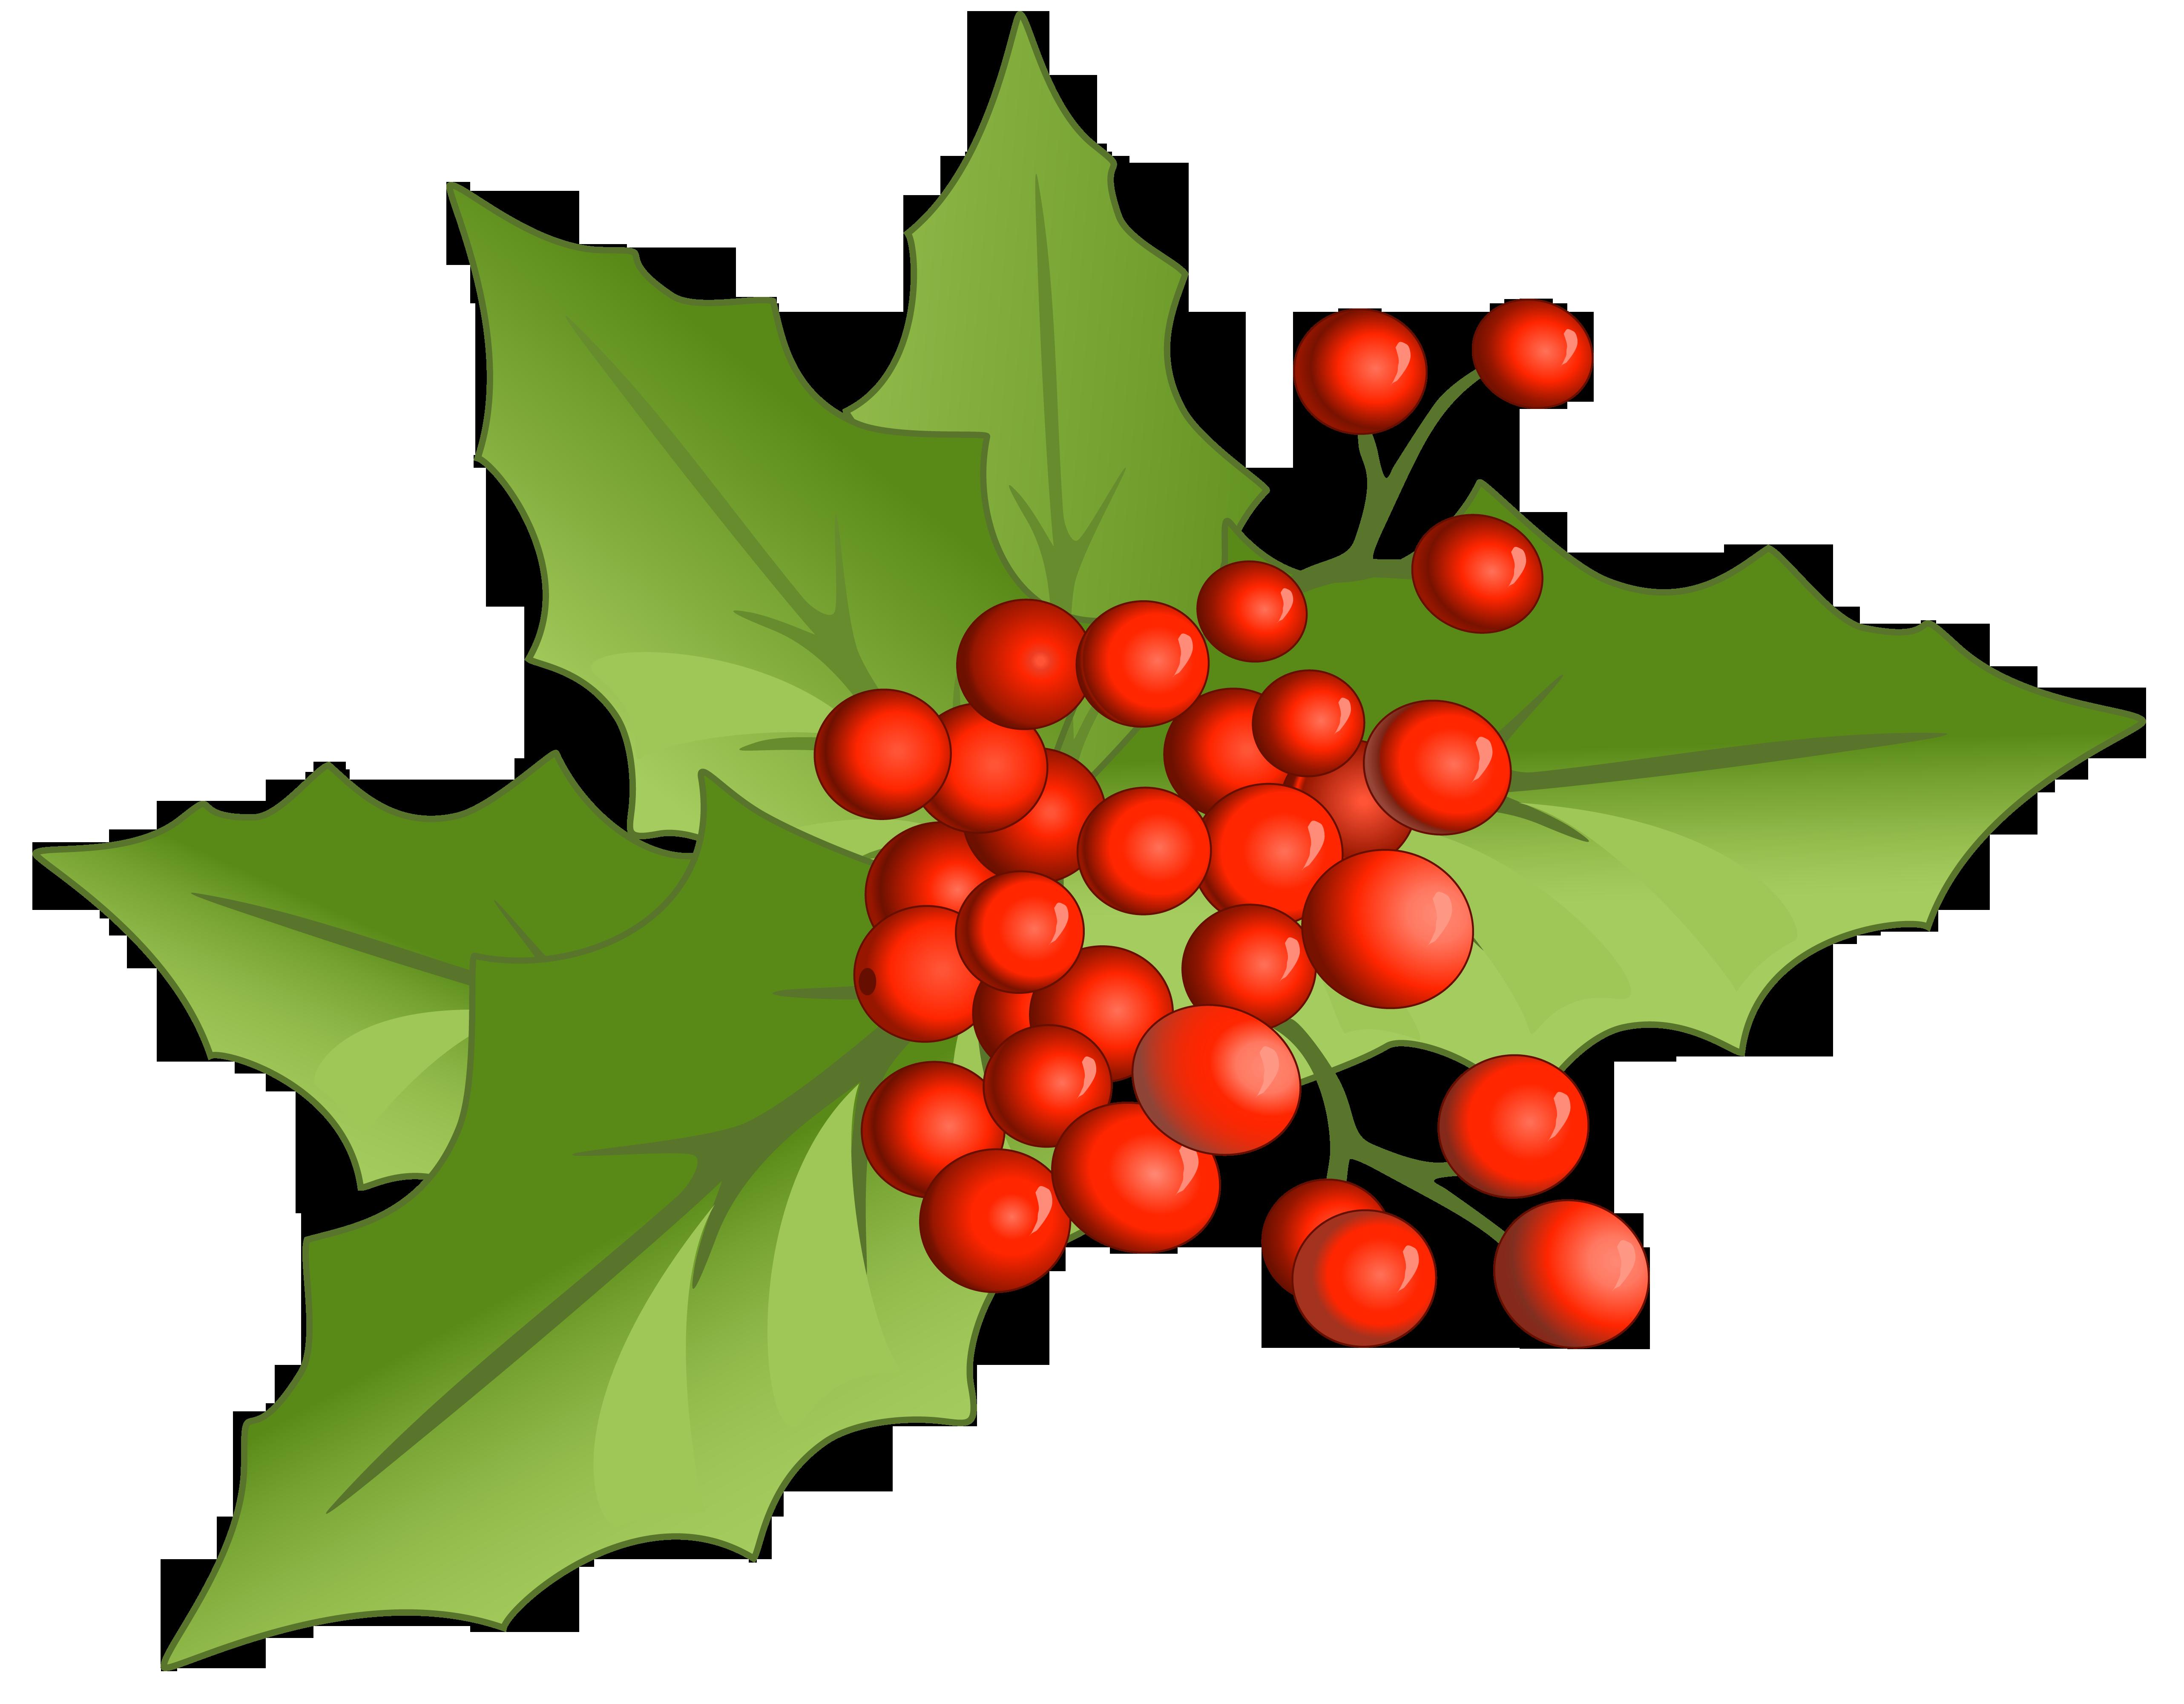 5128x4000 Christmas Greenery Clipart